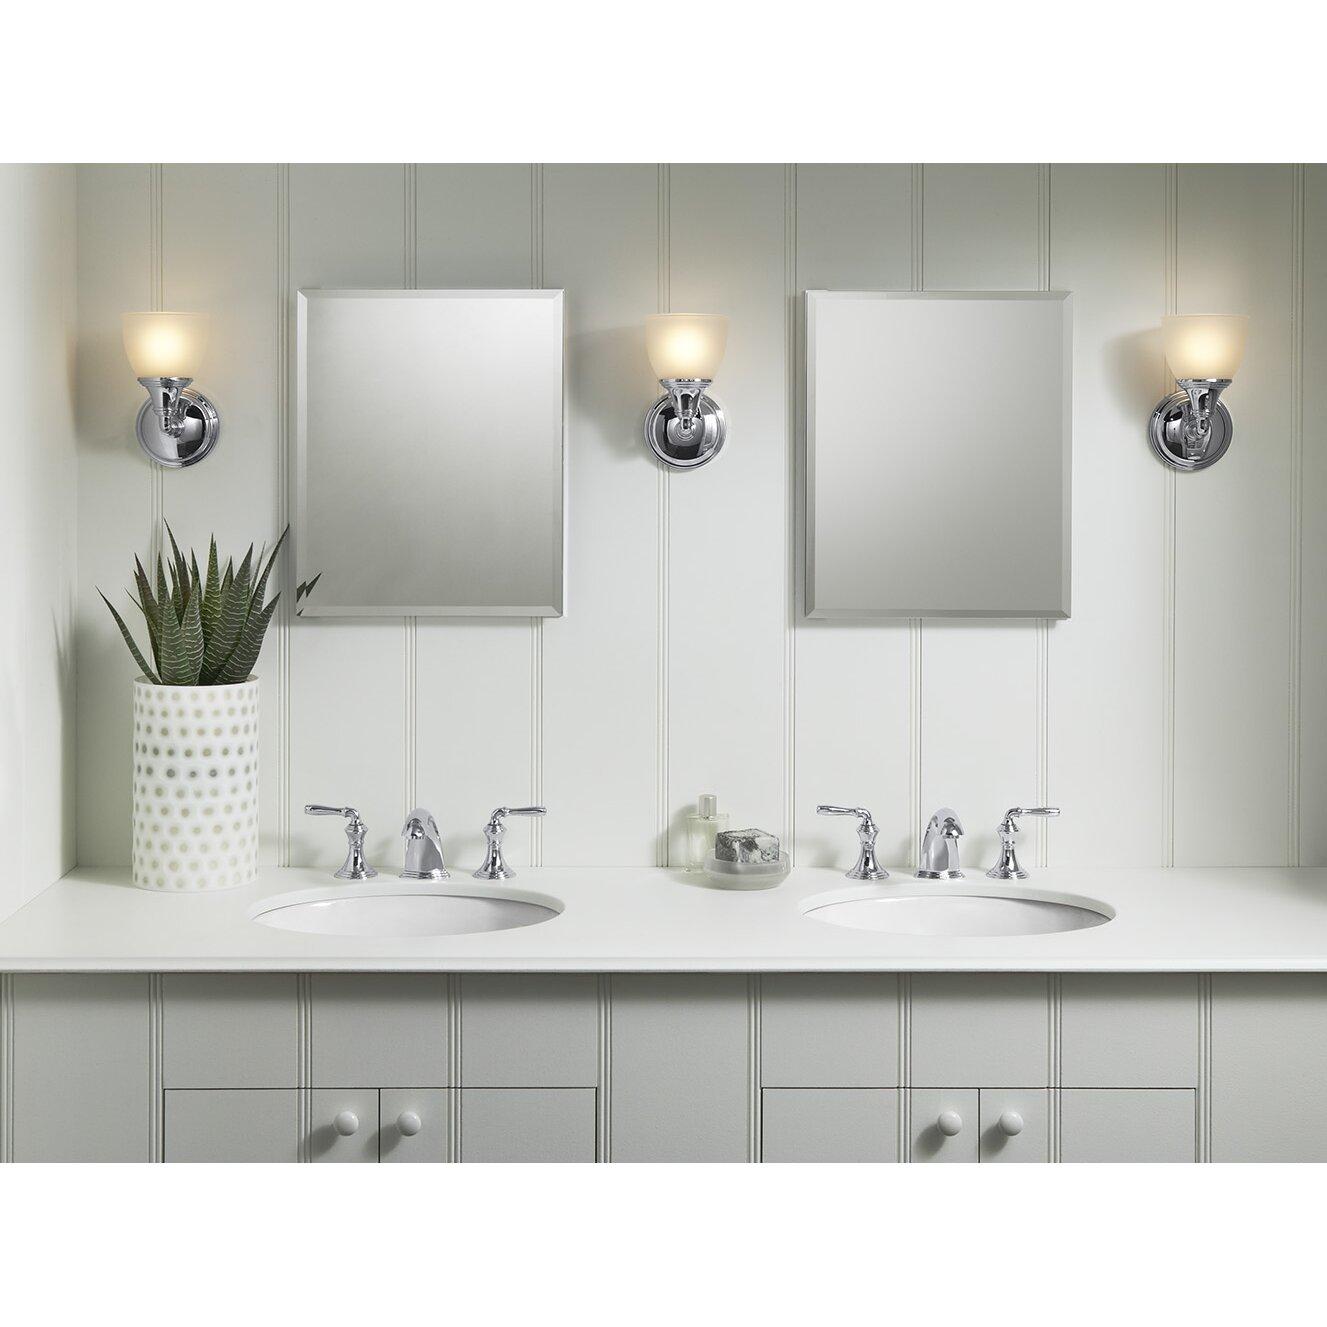 18 X 24 Medicine Cabinet Kohler 16 X 20 Aluminum Mirrored Medicine Cabinet Reviews